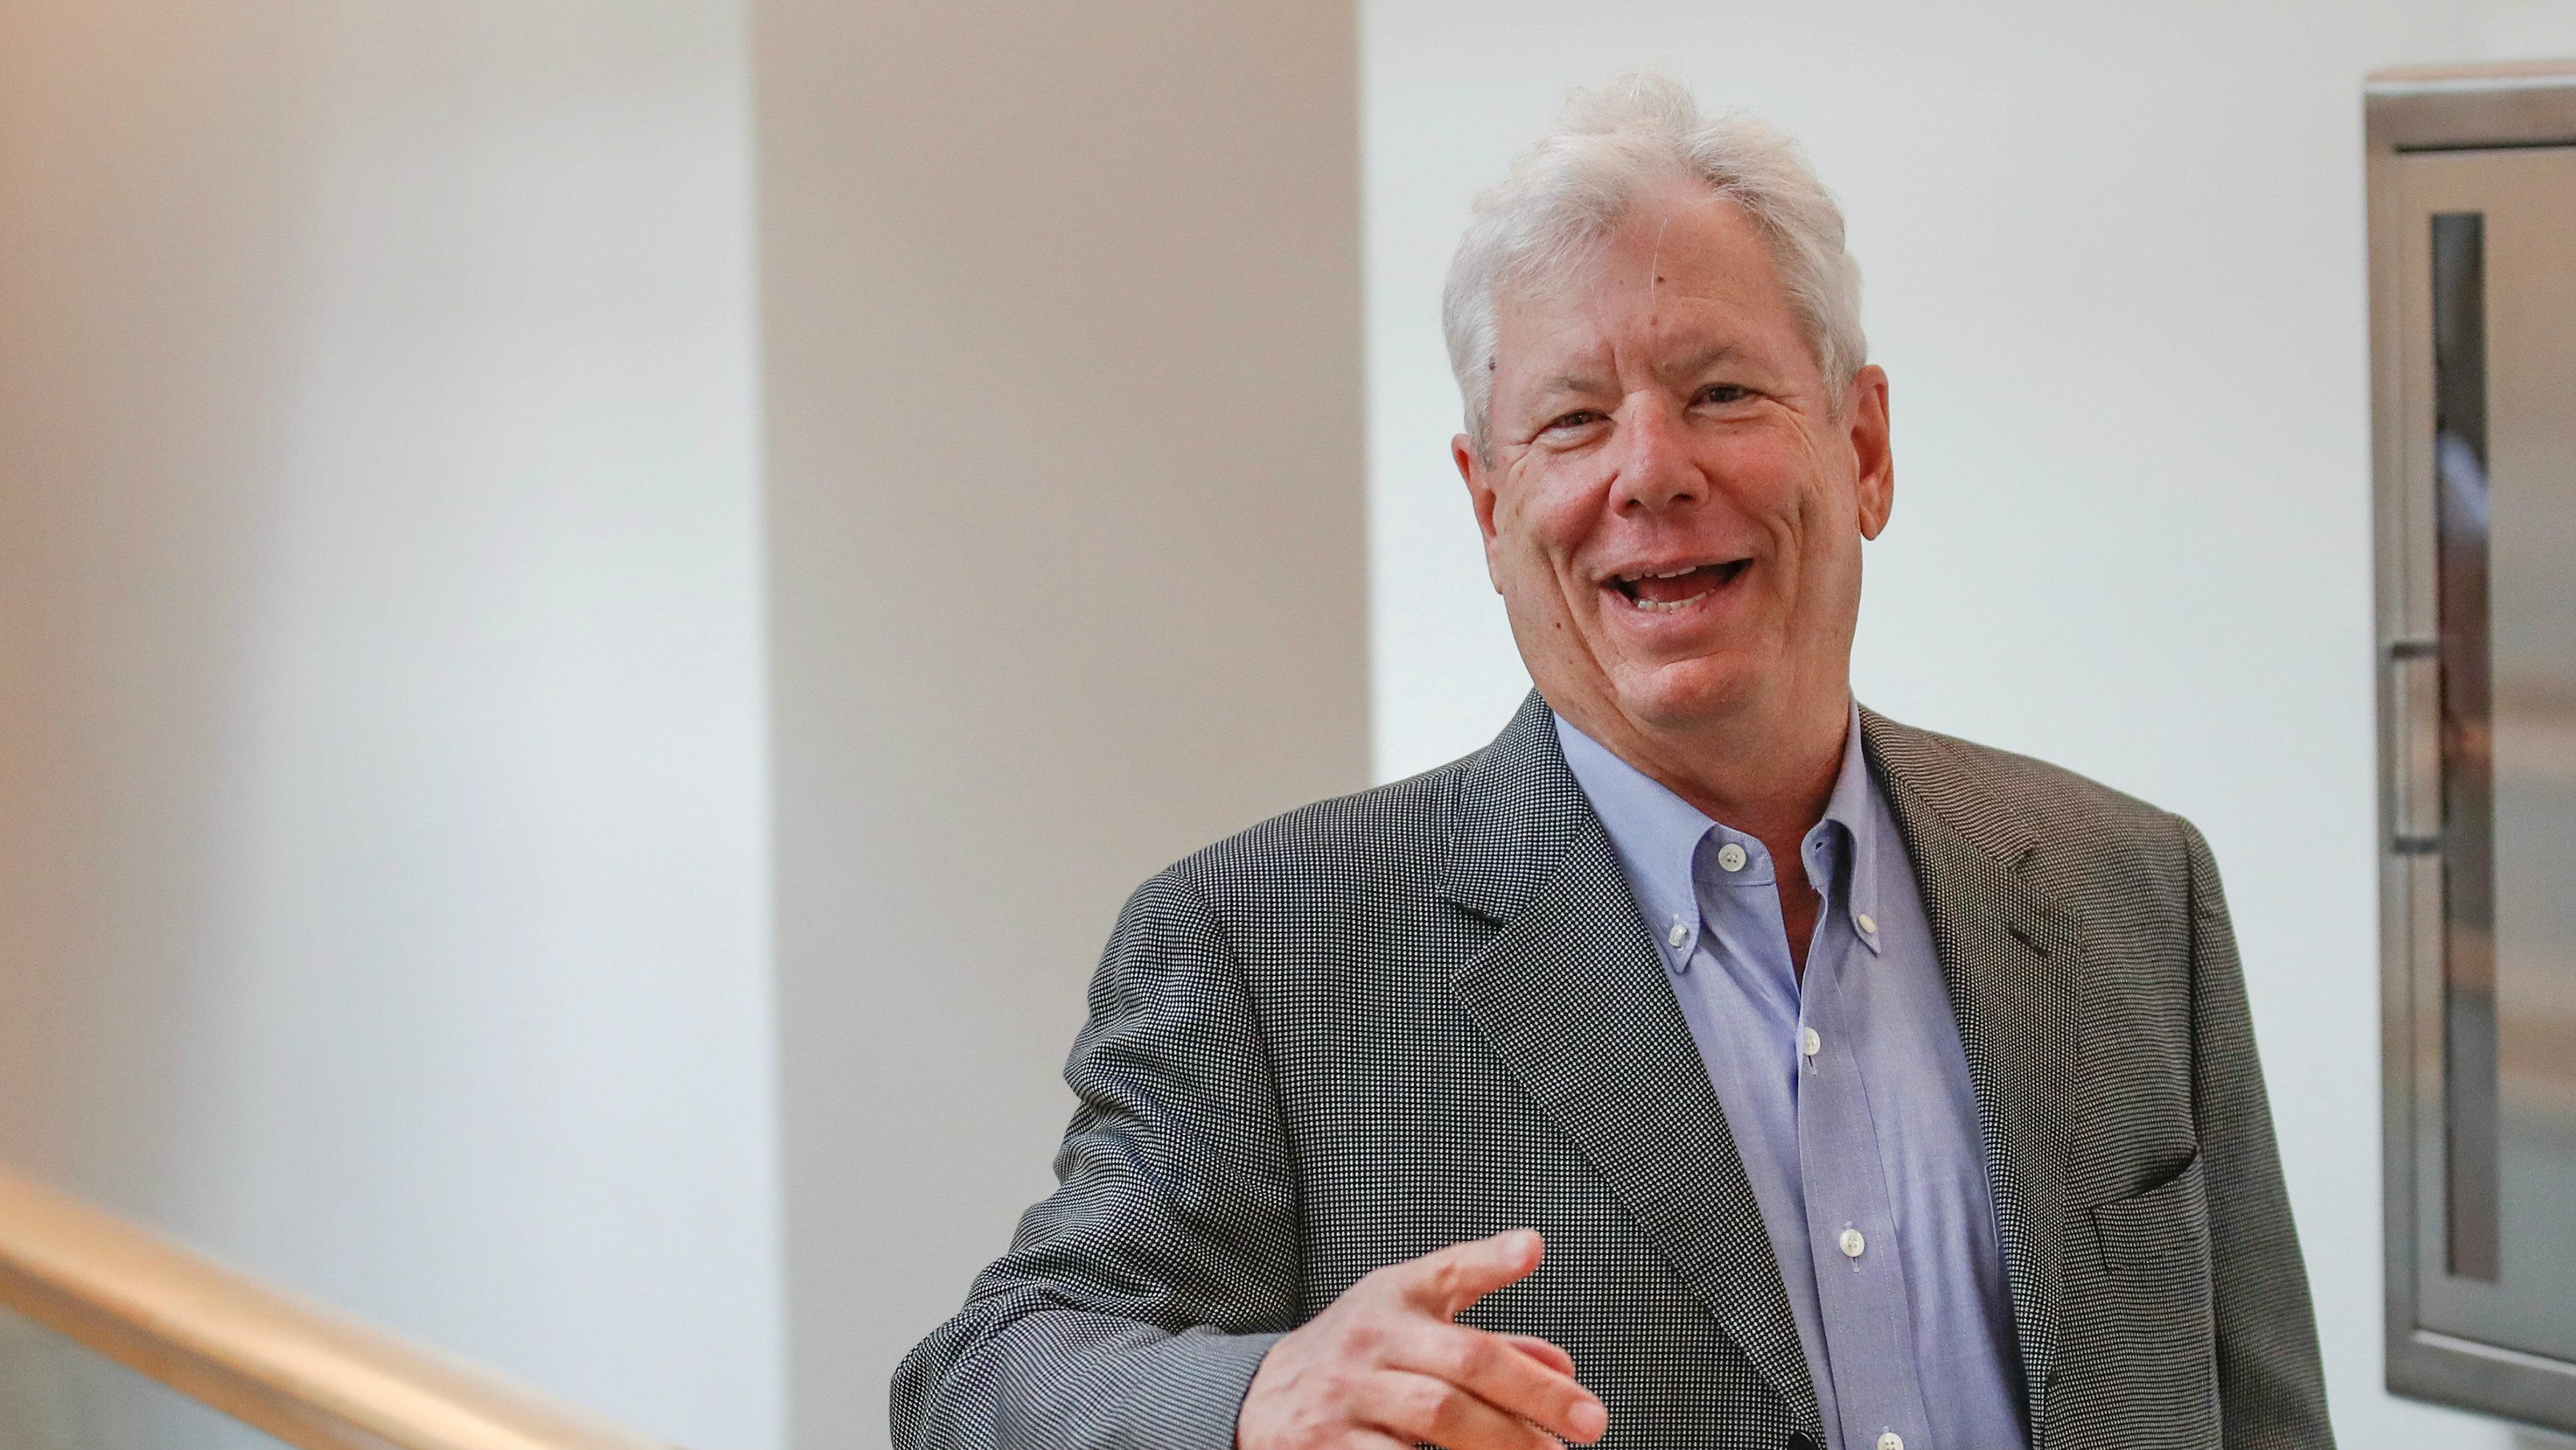 U.S. economist Richard Thaler after winning the 2017 Nobel Economics Prize